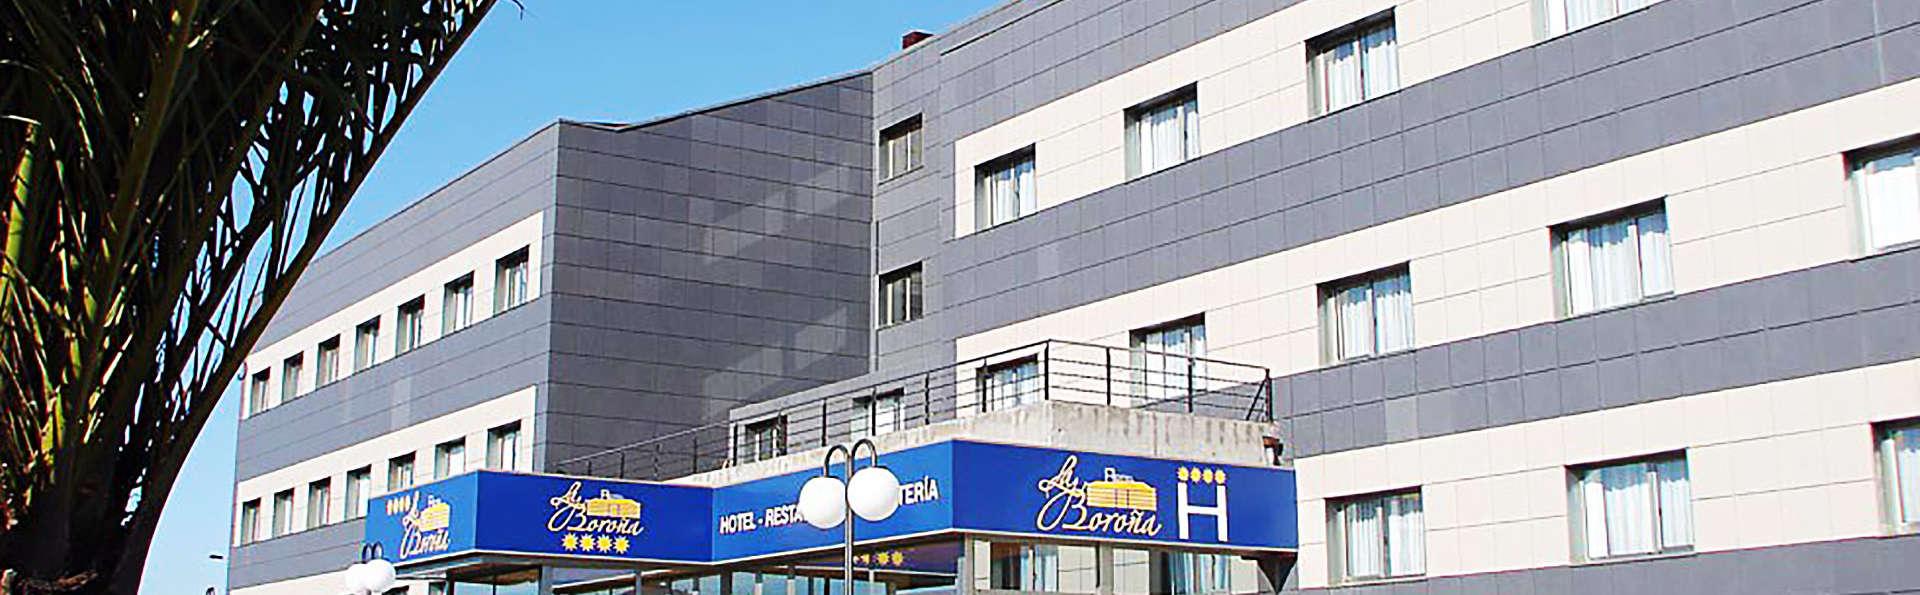 Hotel Sercotel La Boroña - EDIT_front.jpg